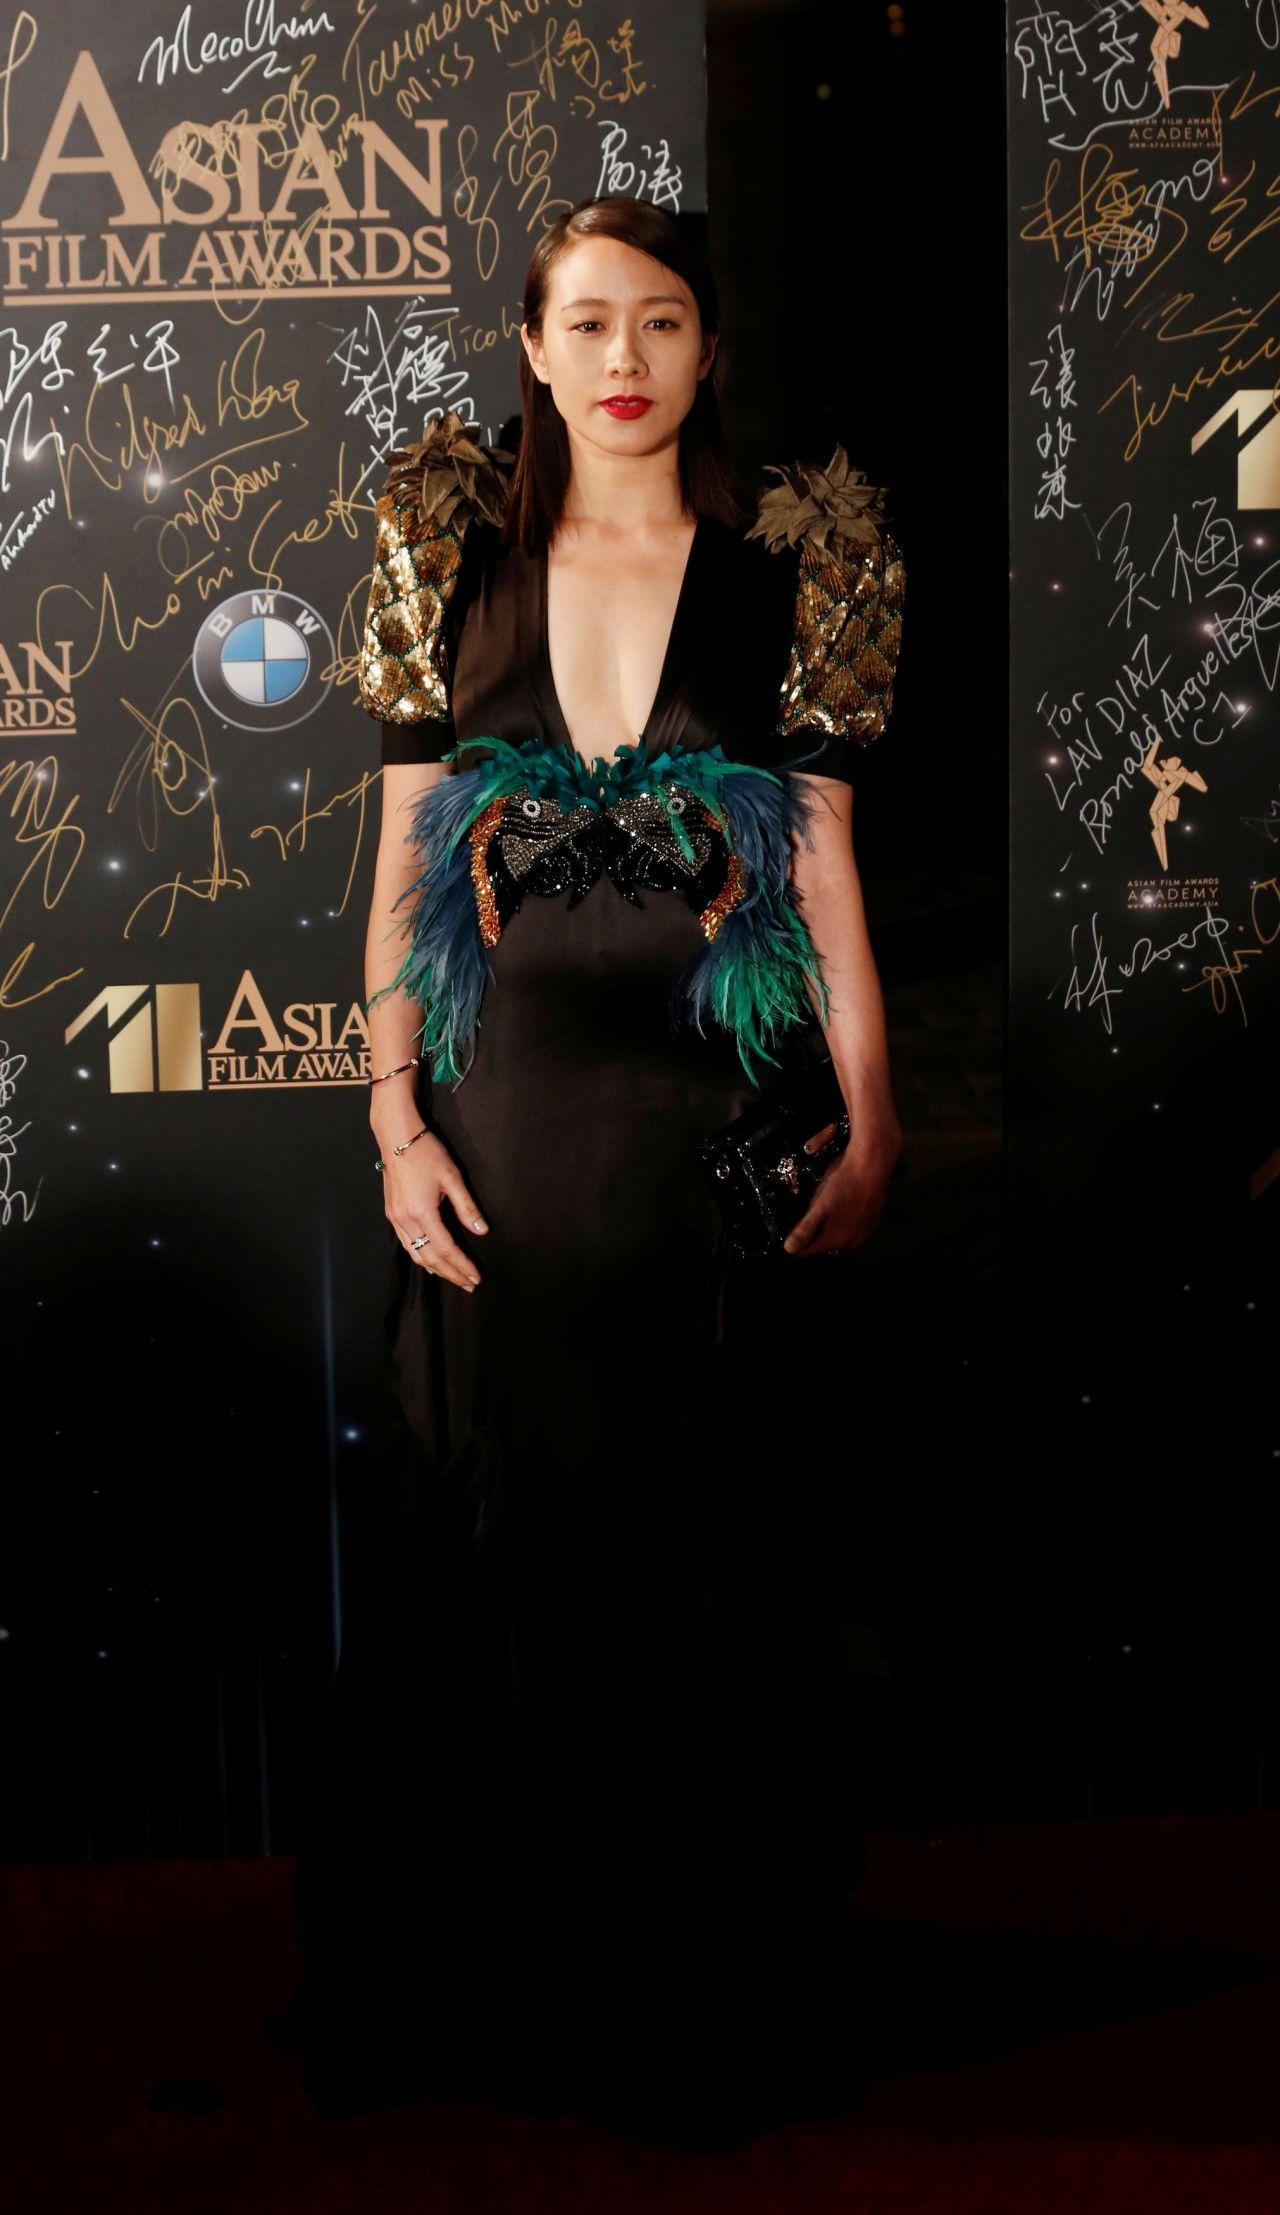 13th Asian Film Awards - Wikipedia